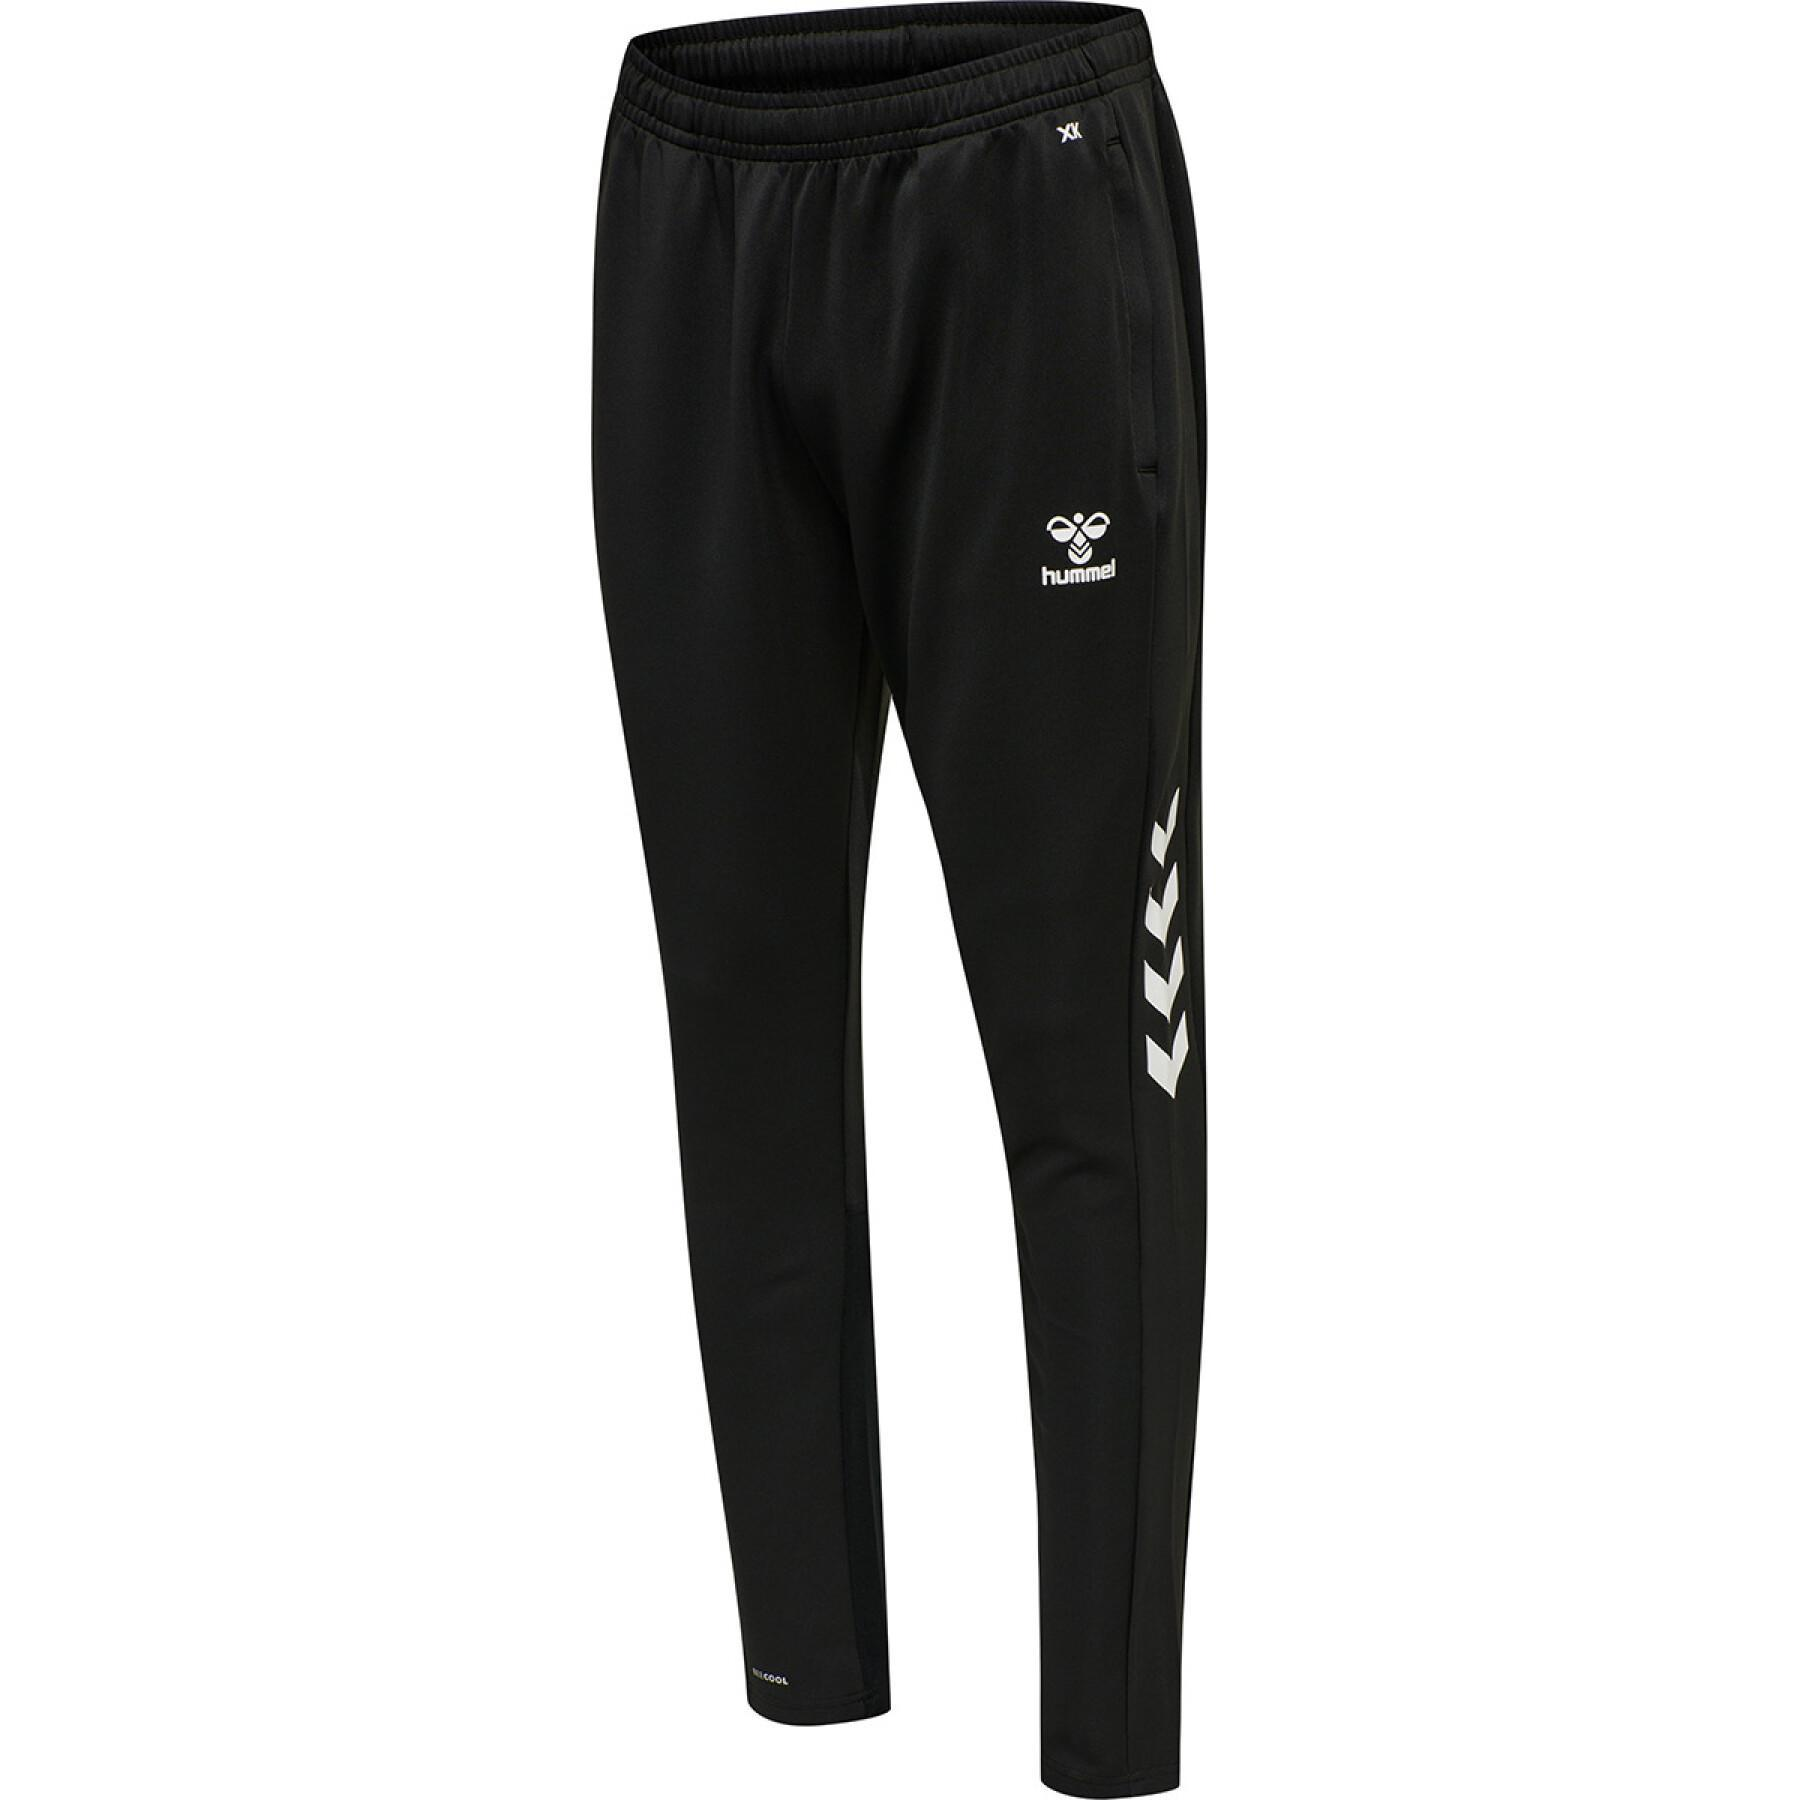 Jogging pants Hummel hmlCORE